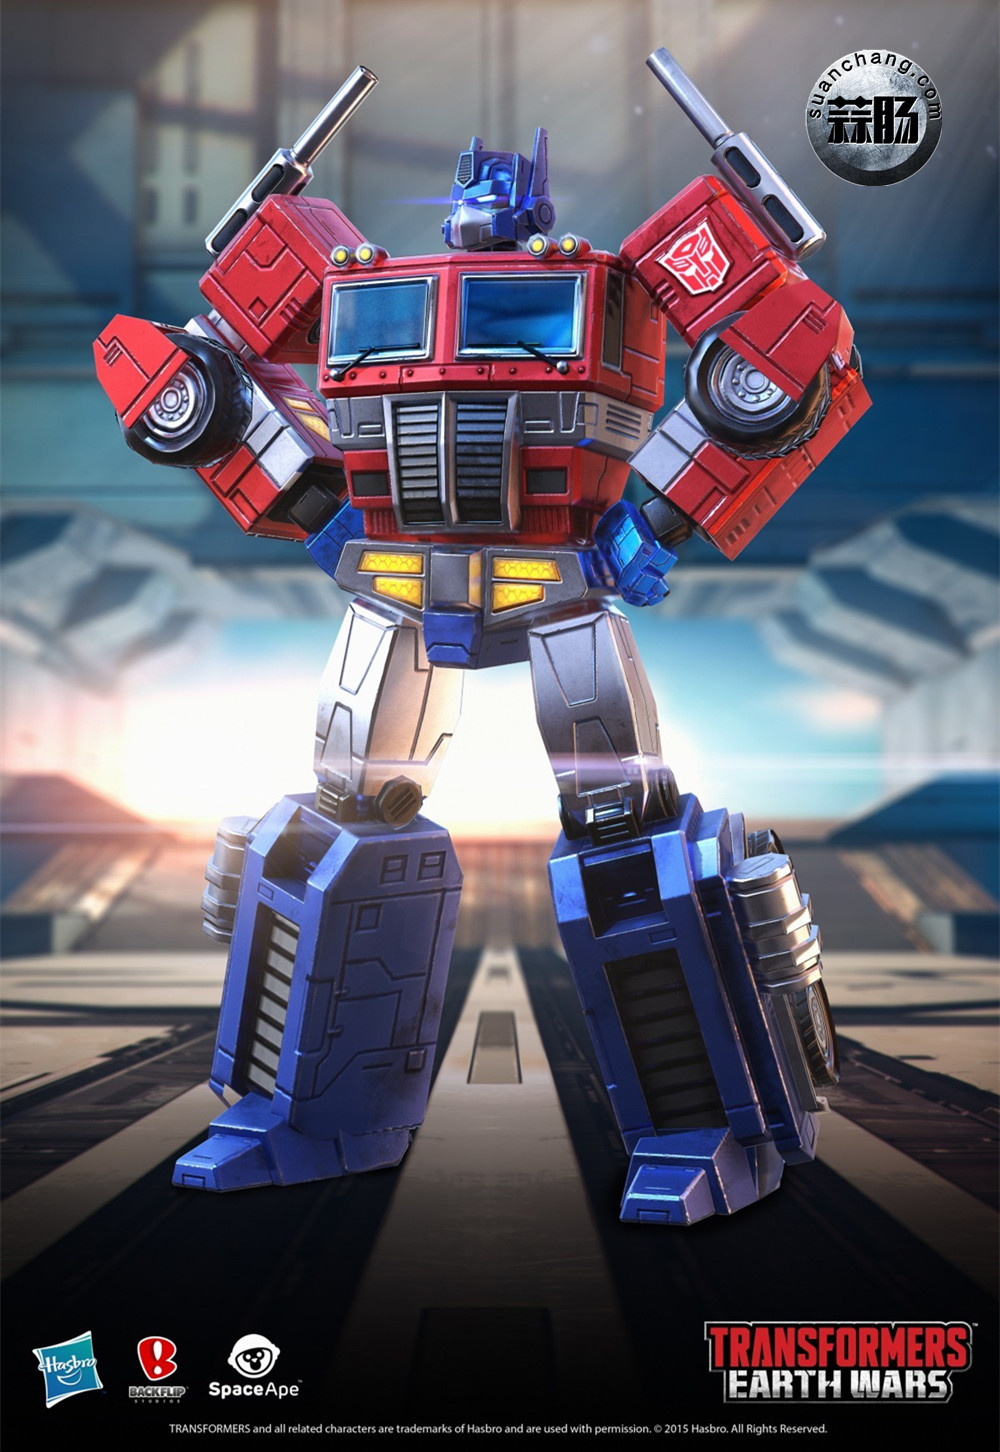 Transformers Earth Wars 游戏人物(一) 动态 第1张